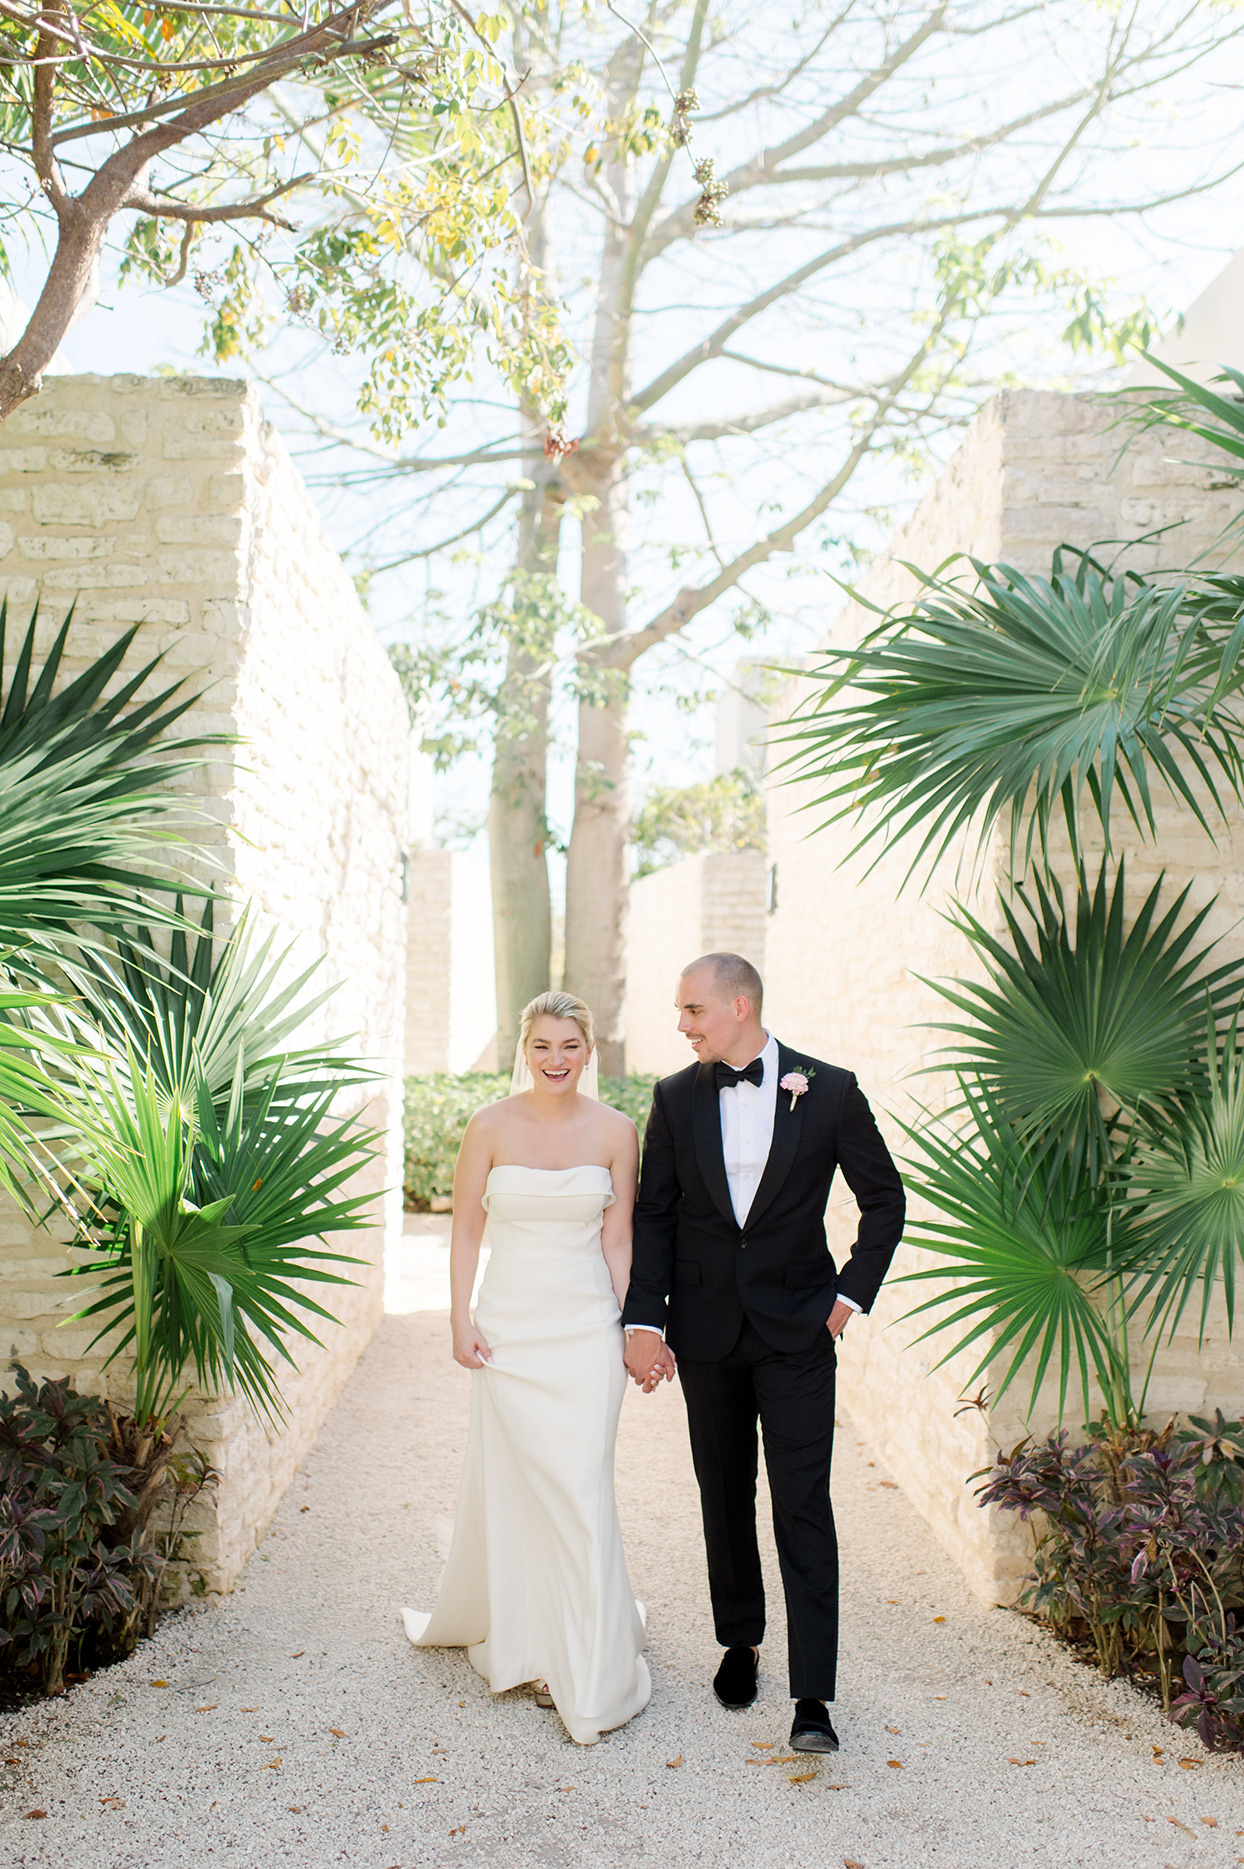 katie nick wedding couple walking through tropical garden